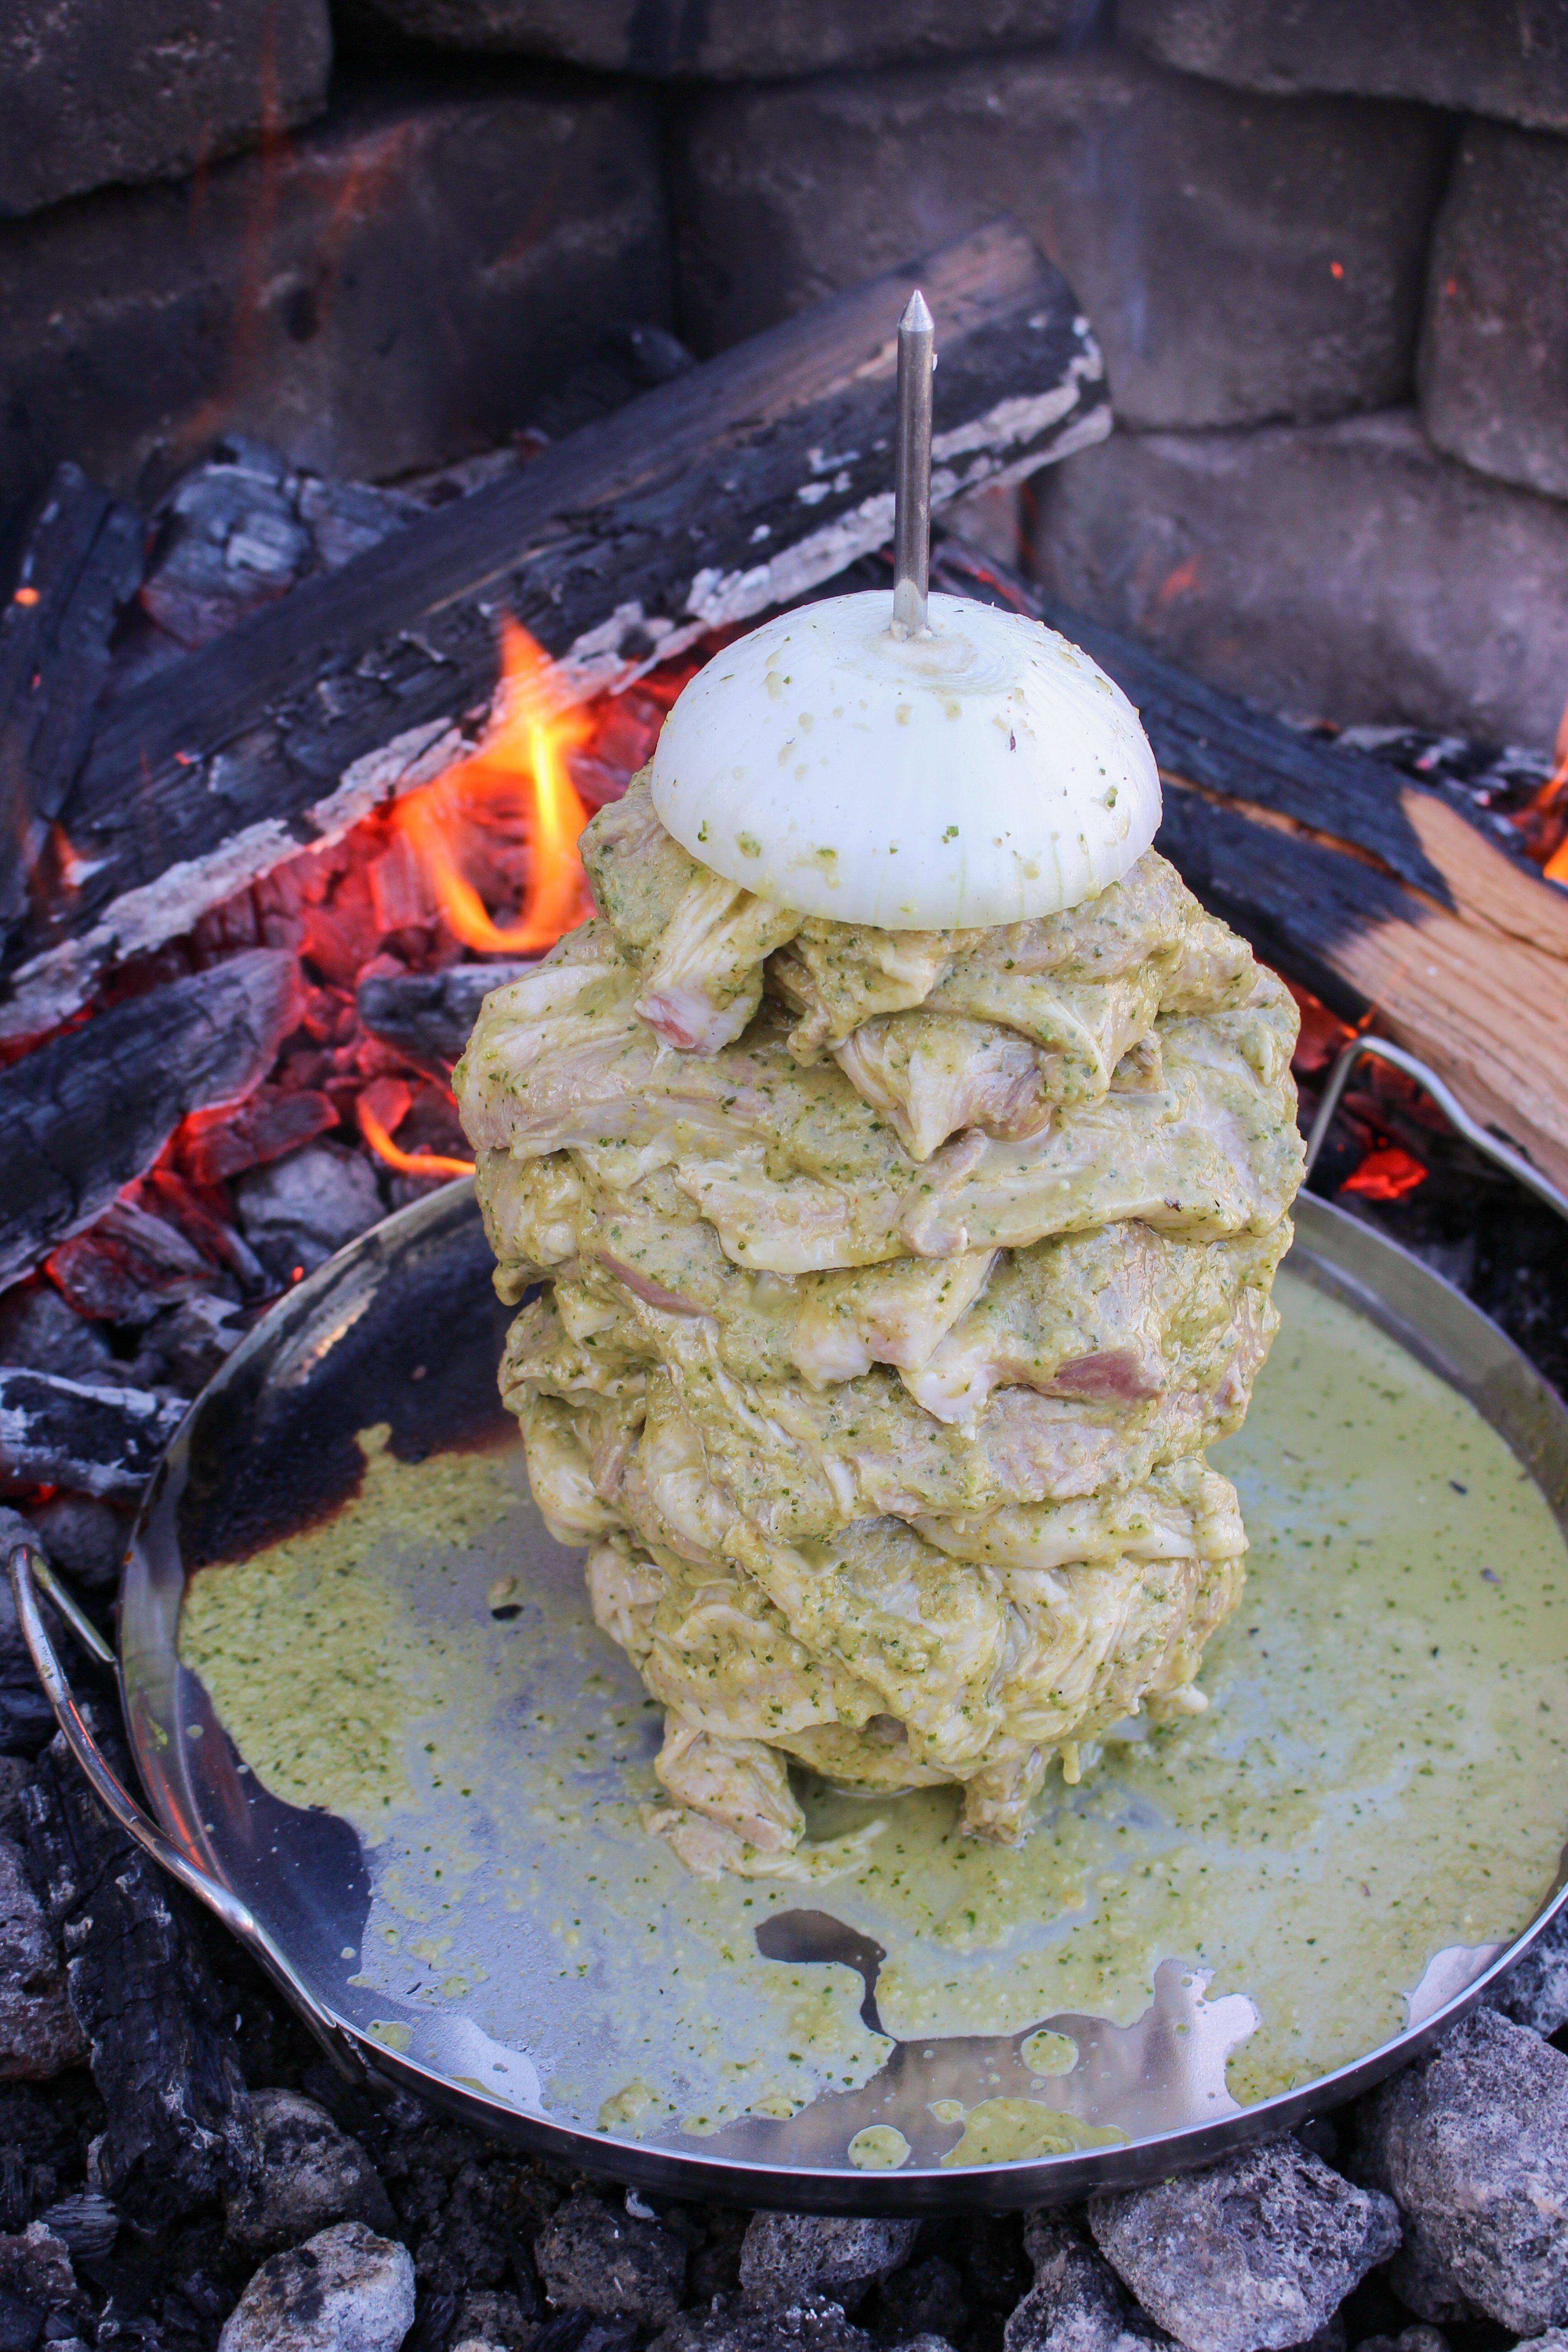 Hatch Chile Mezcal Pork Tacos